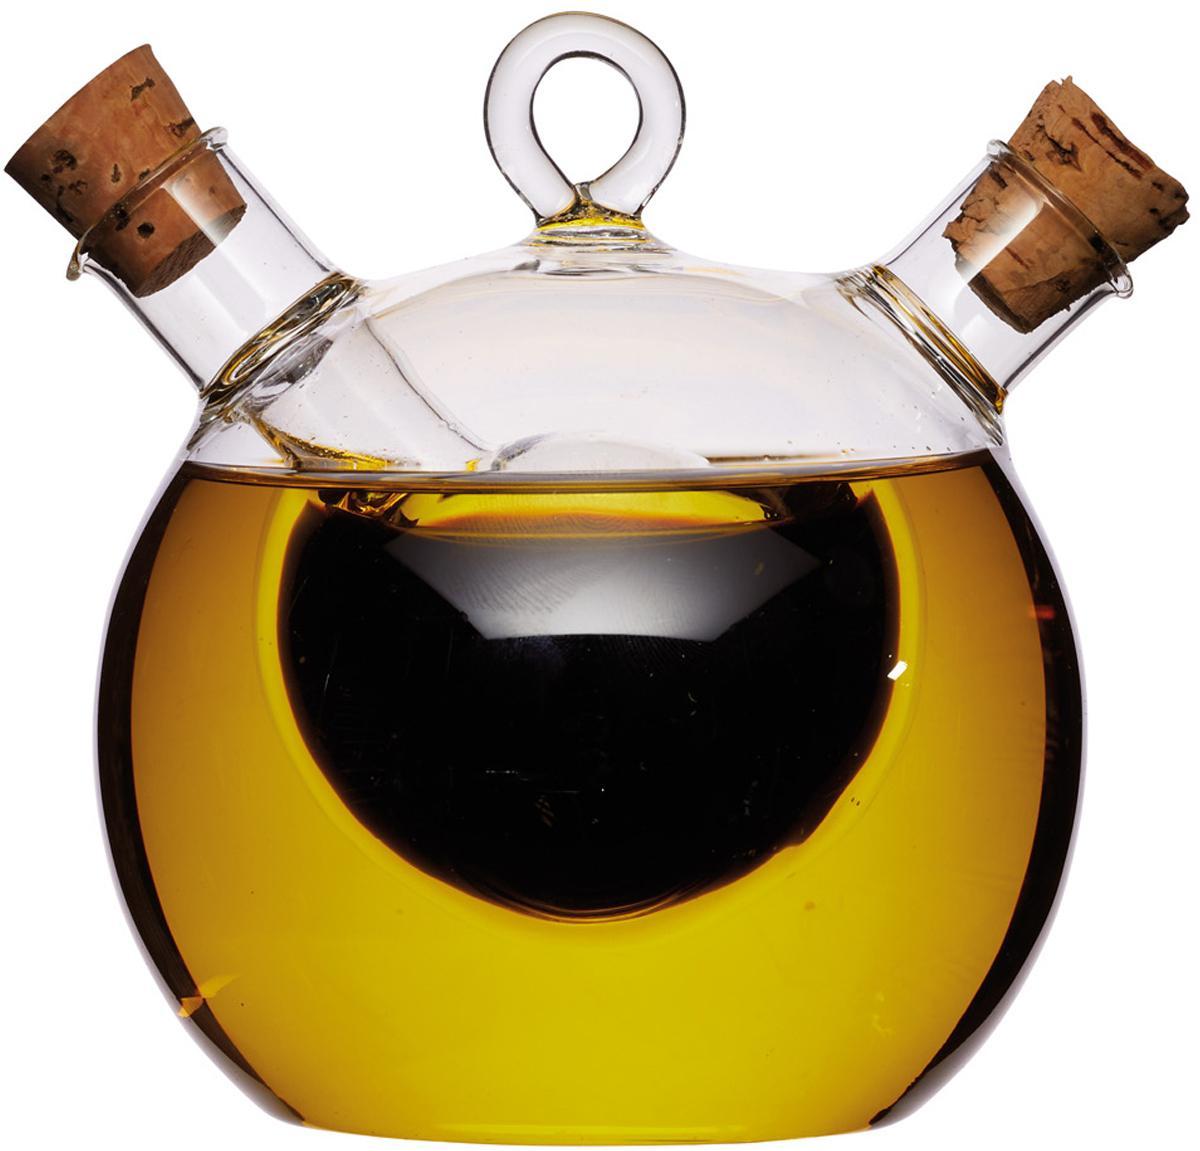 Azijn- en oliedispenser Ital, Glas, Transparant, Ø 9 x H 12 cm